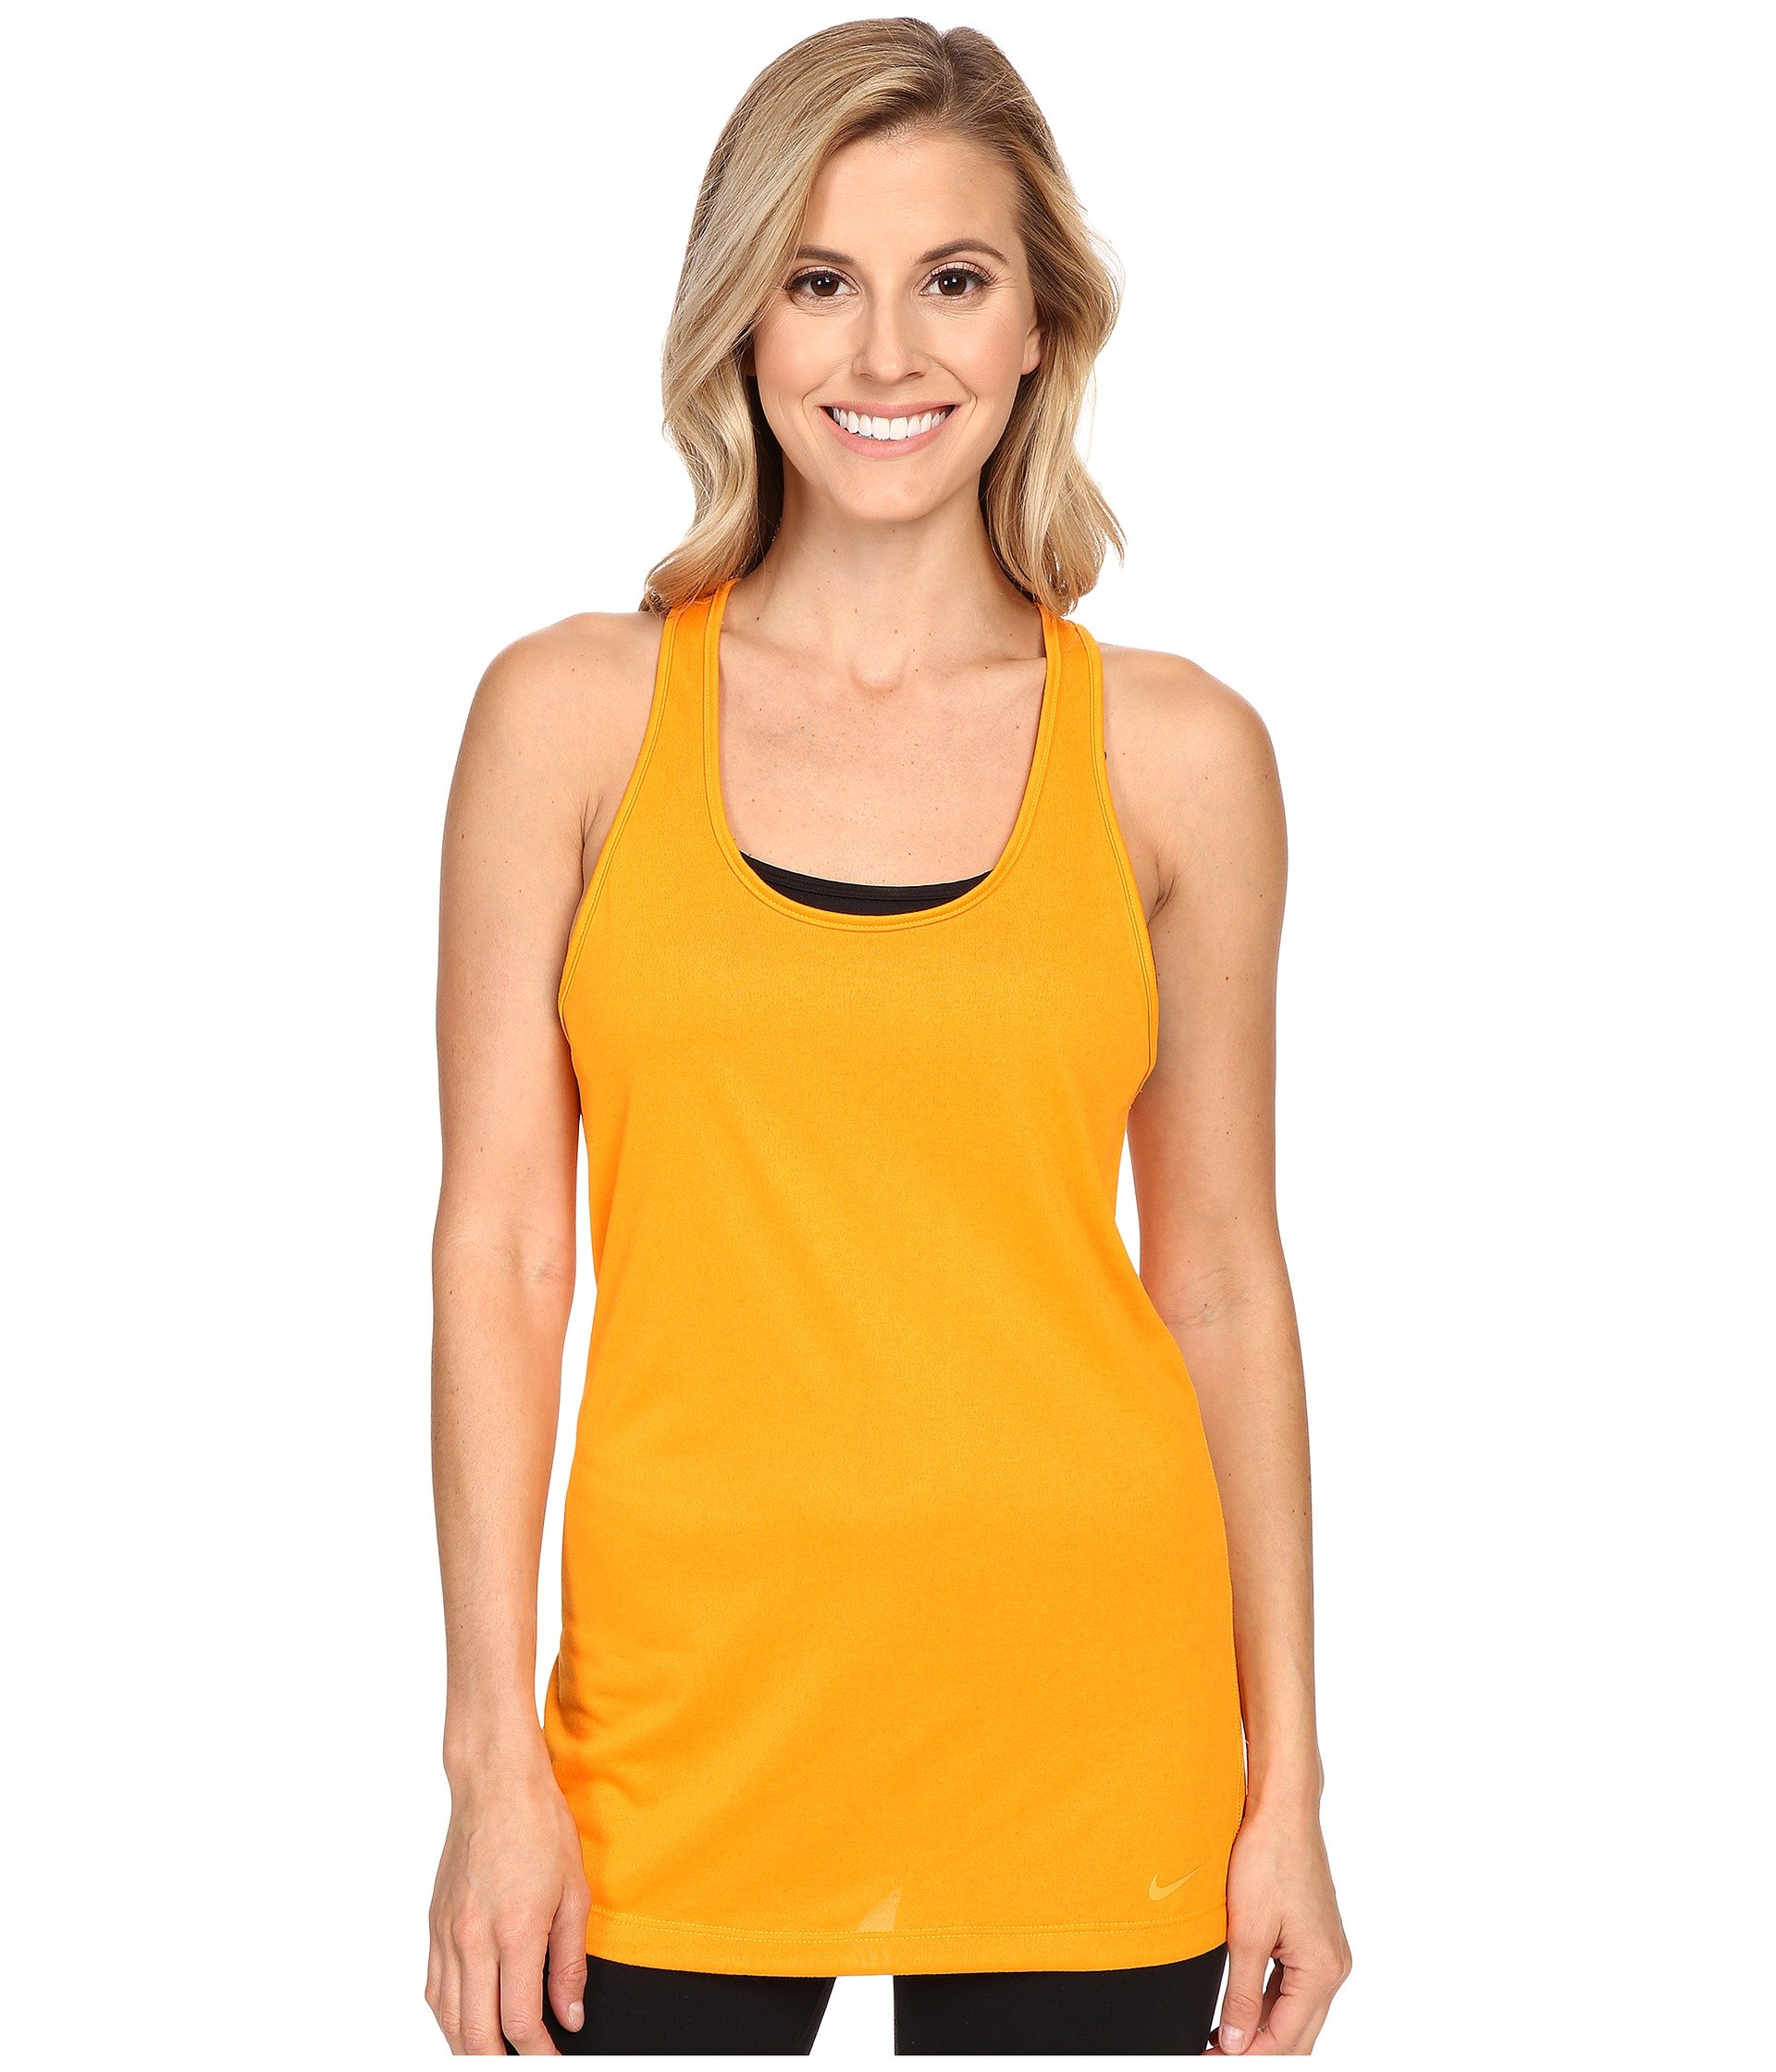 NIKE Women's Dry Balance Tank, Orange, X-Small